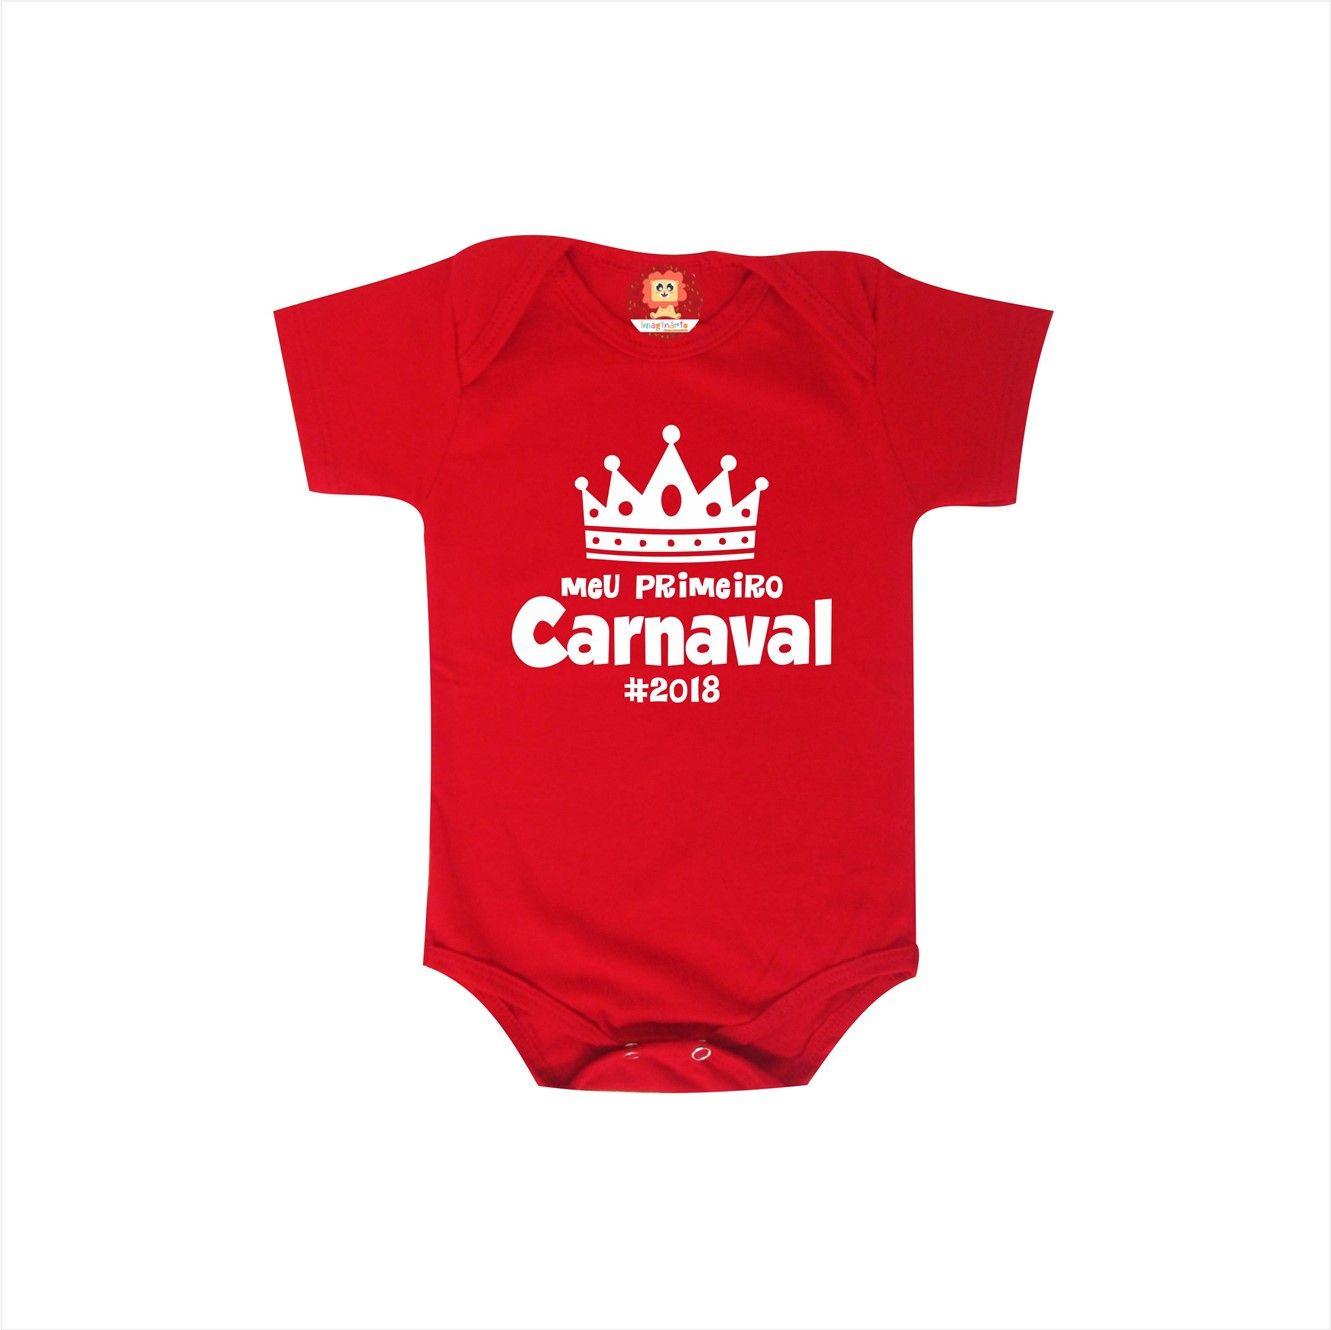 Body Meu Primeiro Carnaval 2018